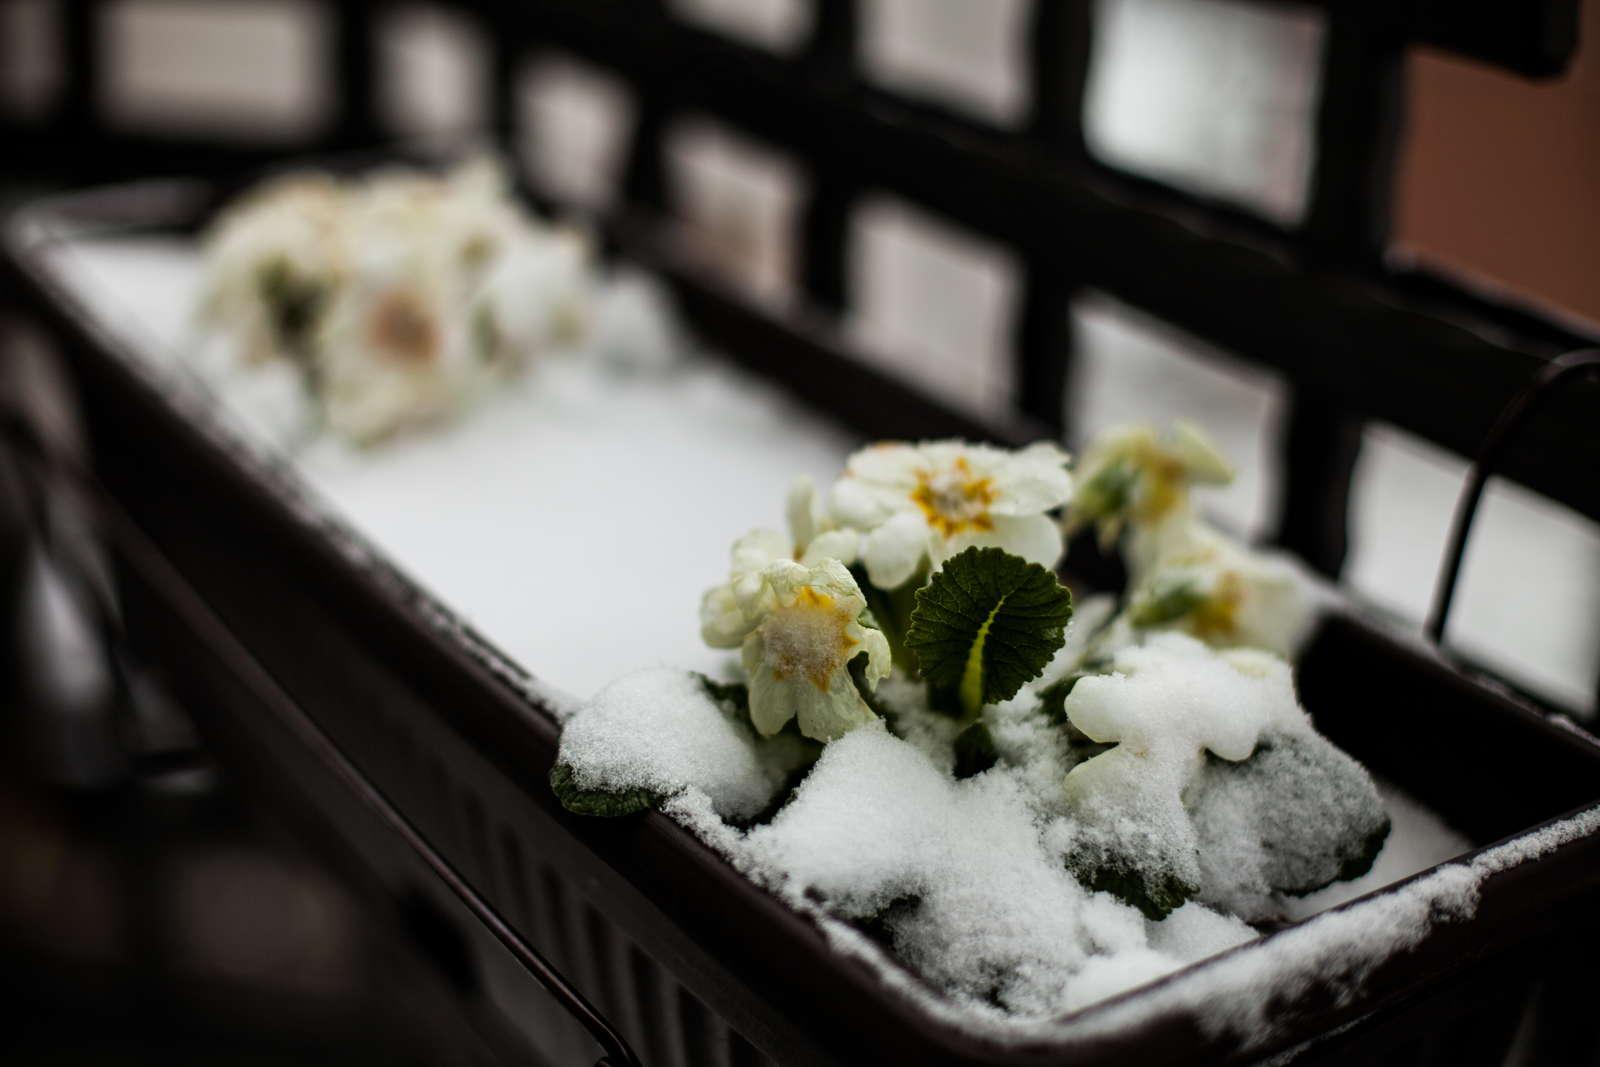 Winterharte Balkonpflanzen Robuste Pflanzen Fur Den Balkon